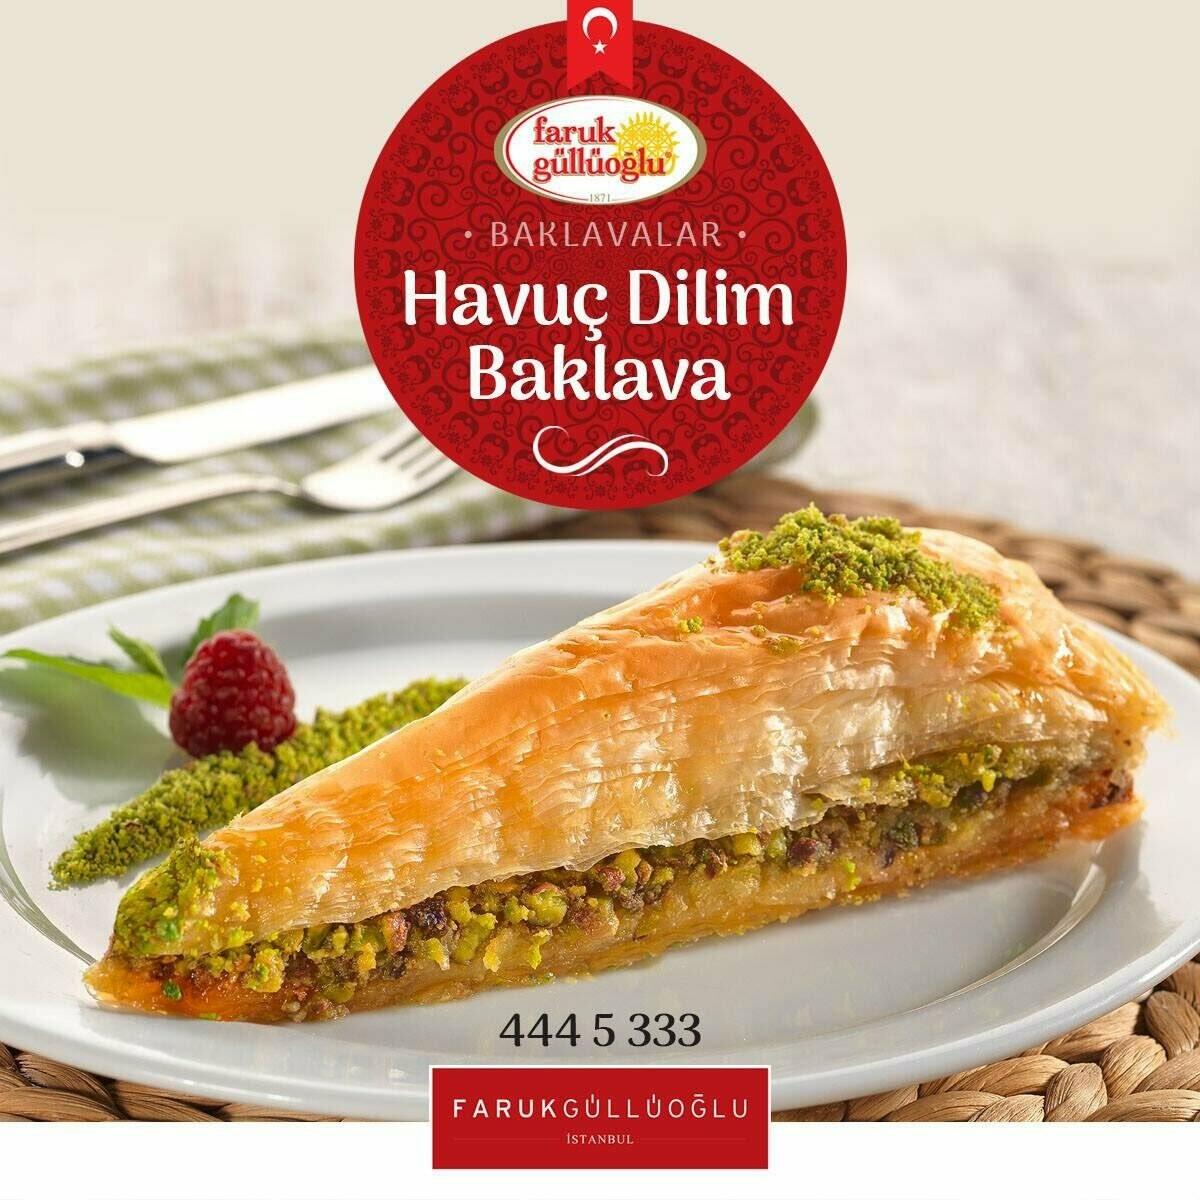 Faruk Gullu Gulluoglu Fistikli Havuc Baklava / Carrot Slices with Pistachios Baklava 5.5lb